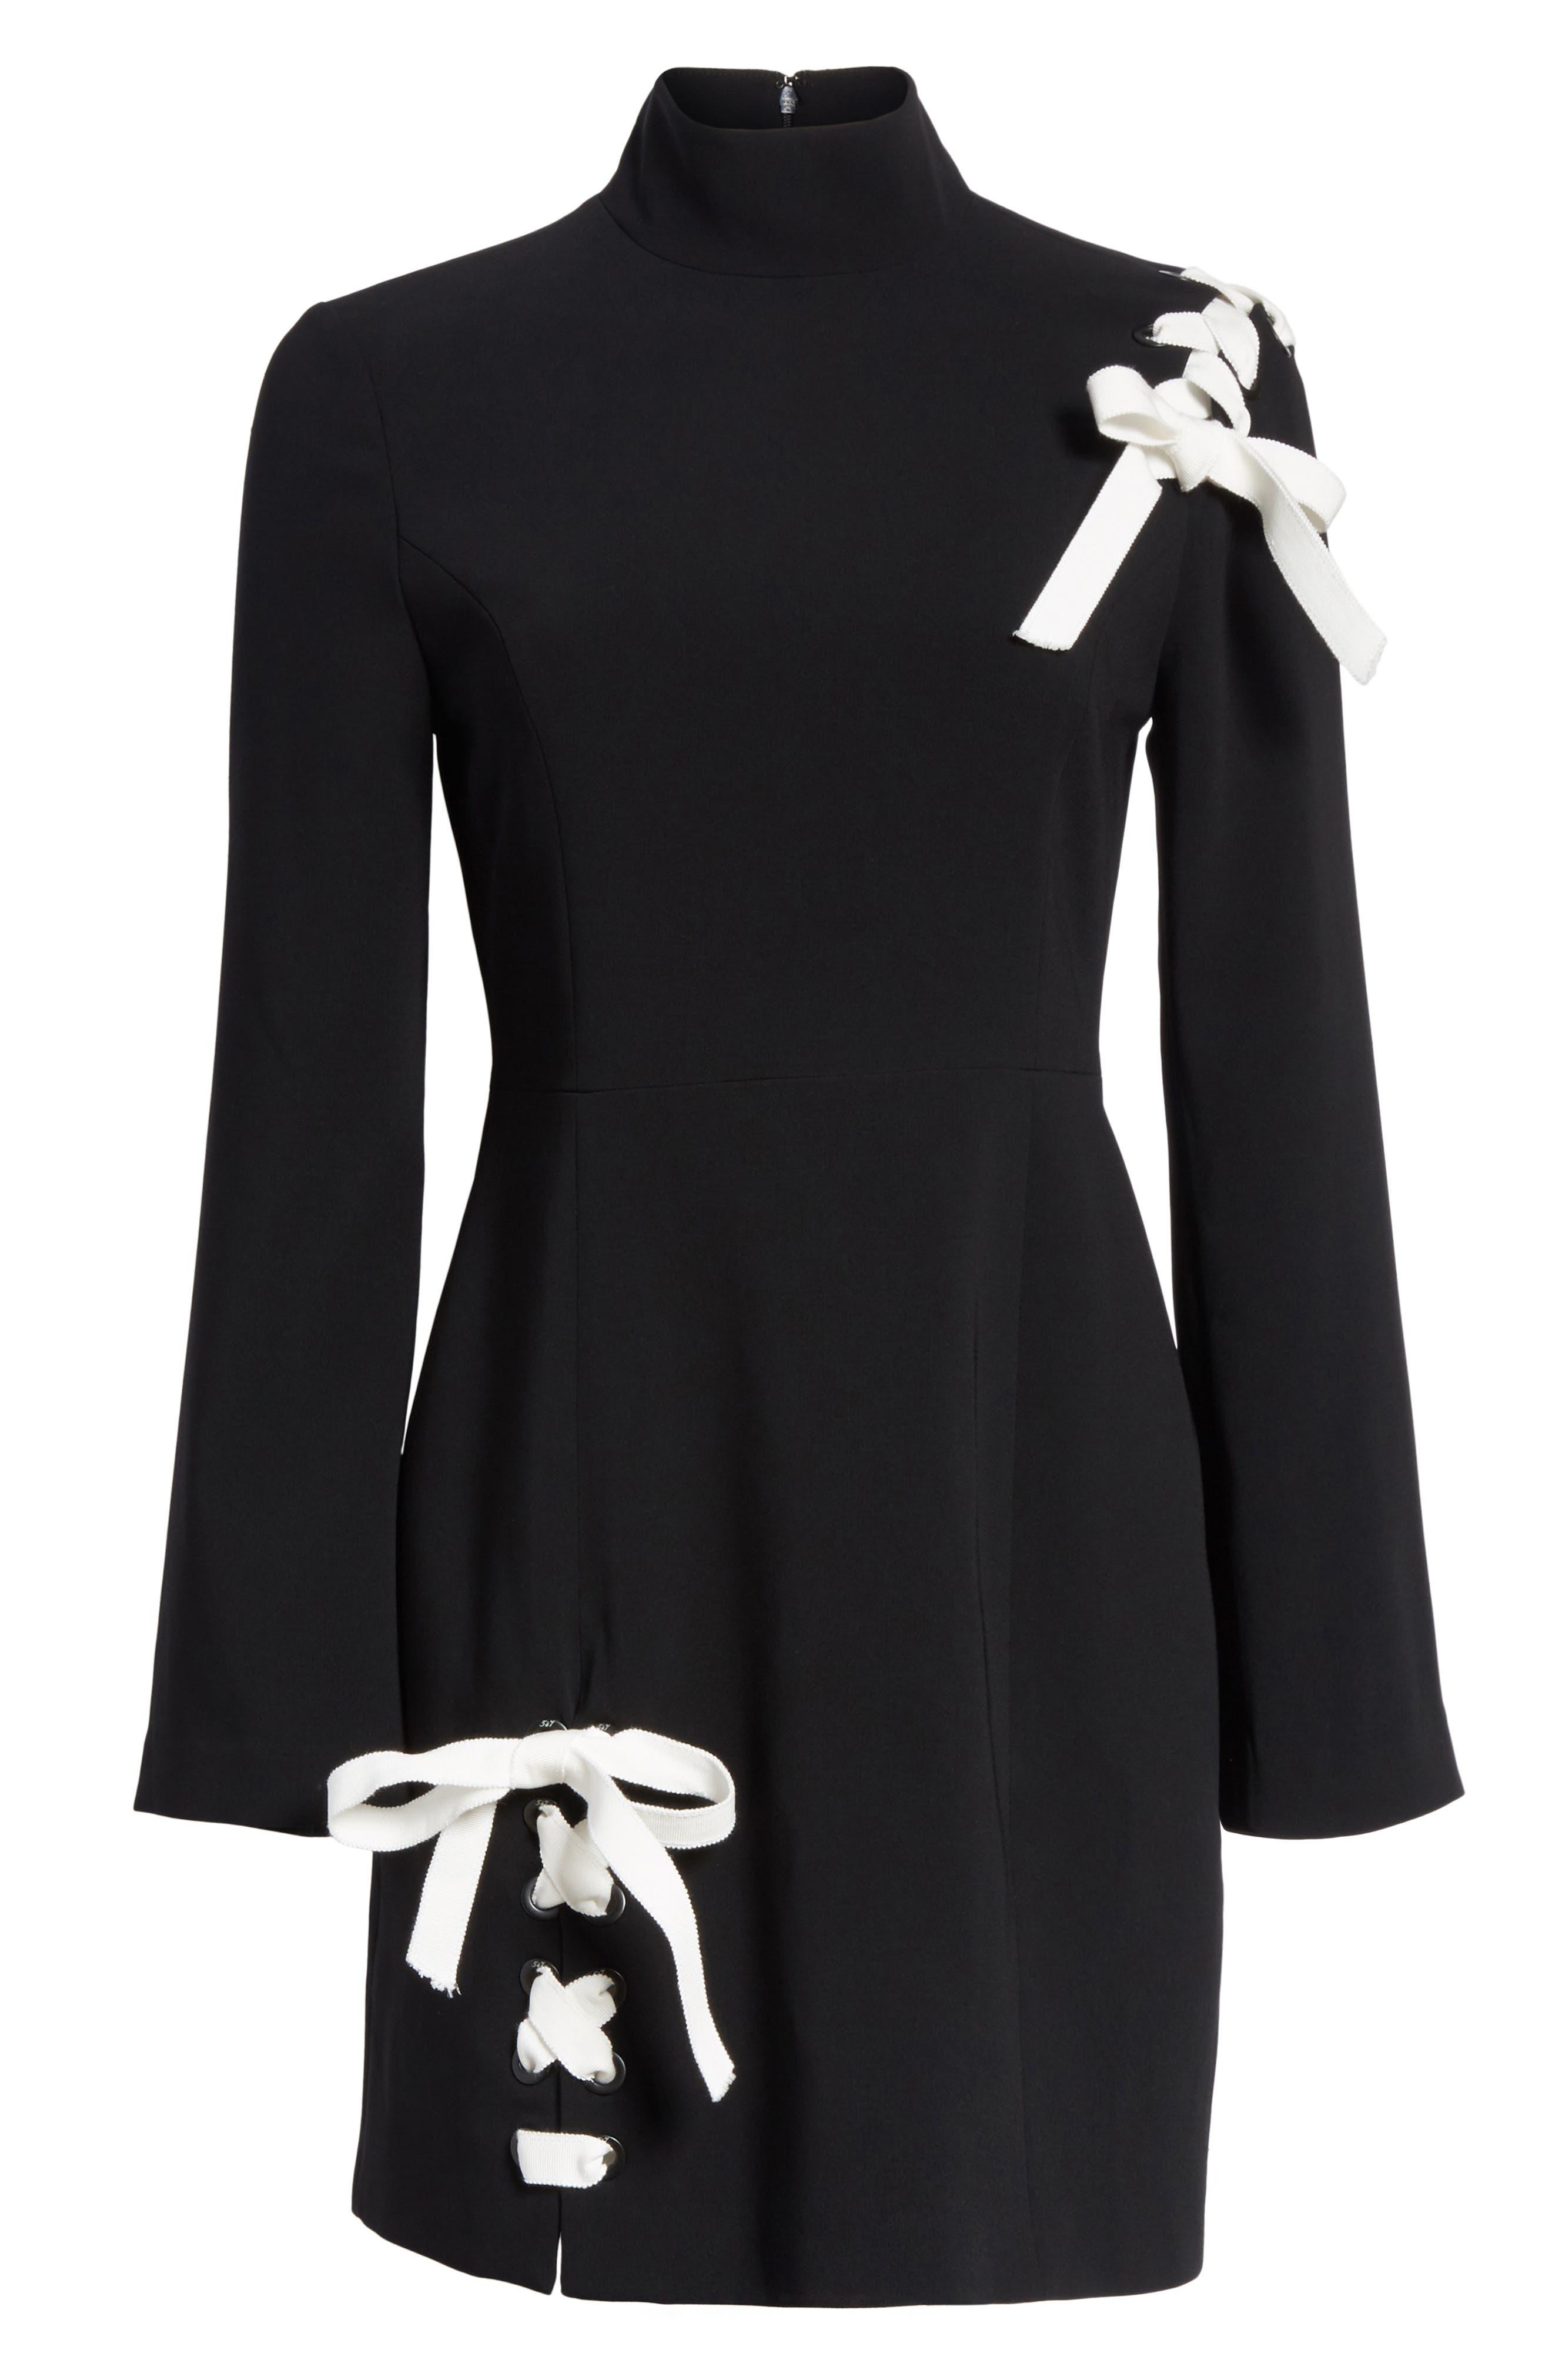 Izella Crepe Minidress,                             Alternate thumbnail 6, color,                             Black/ Ivory